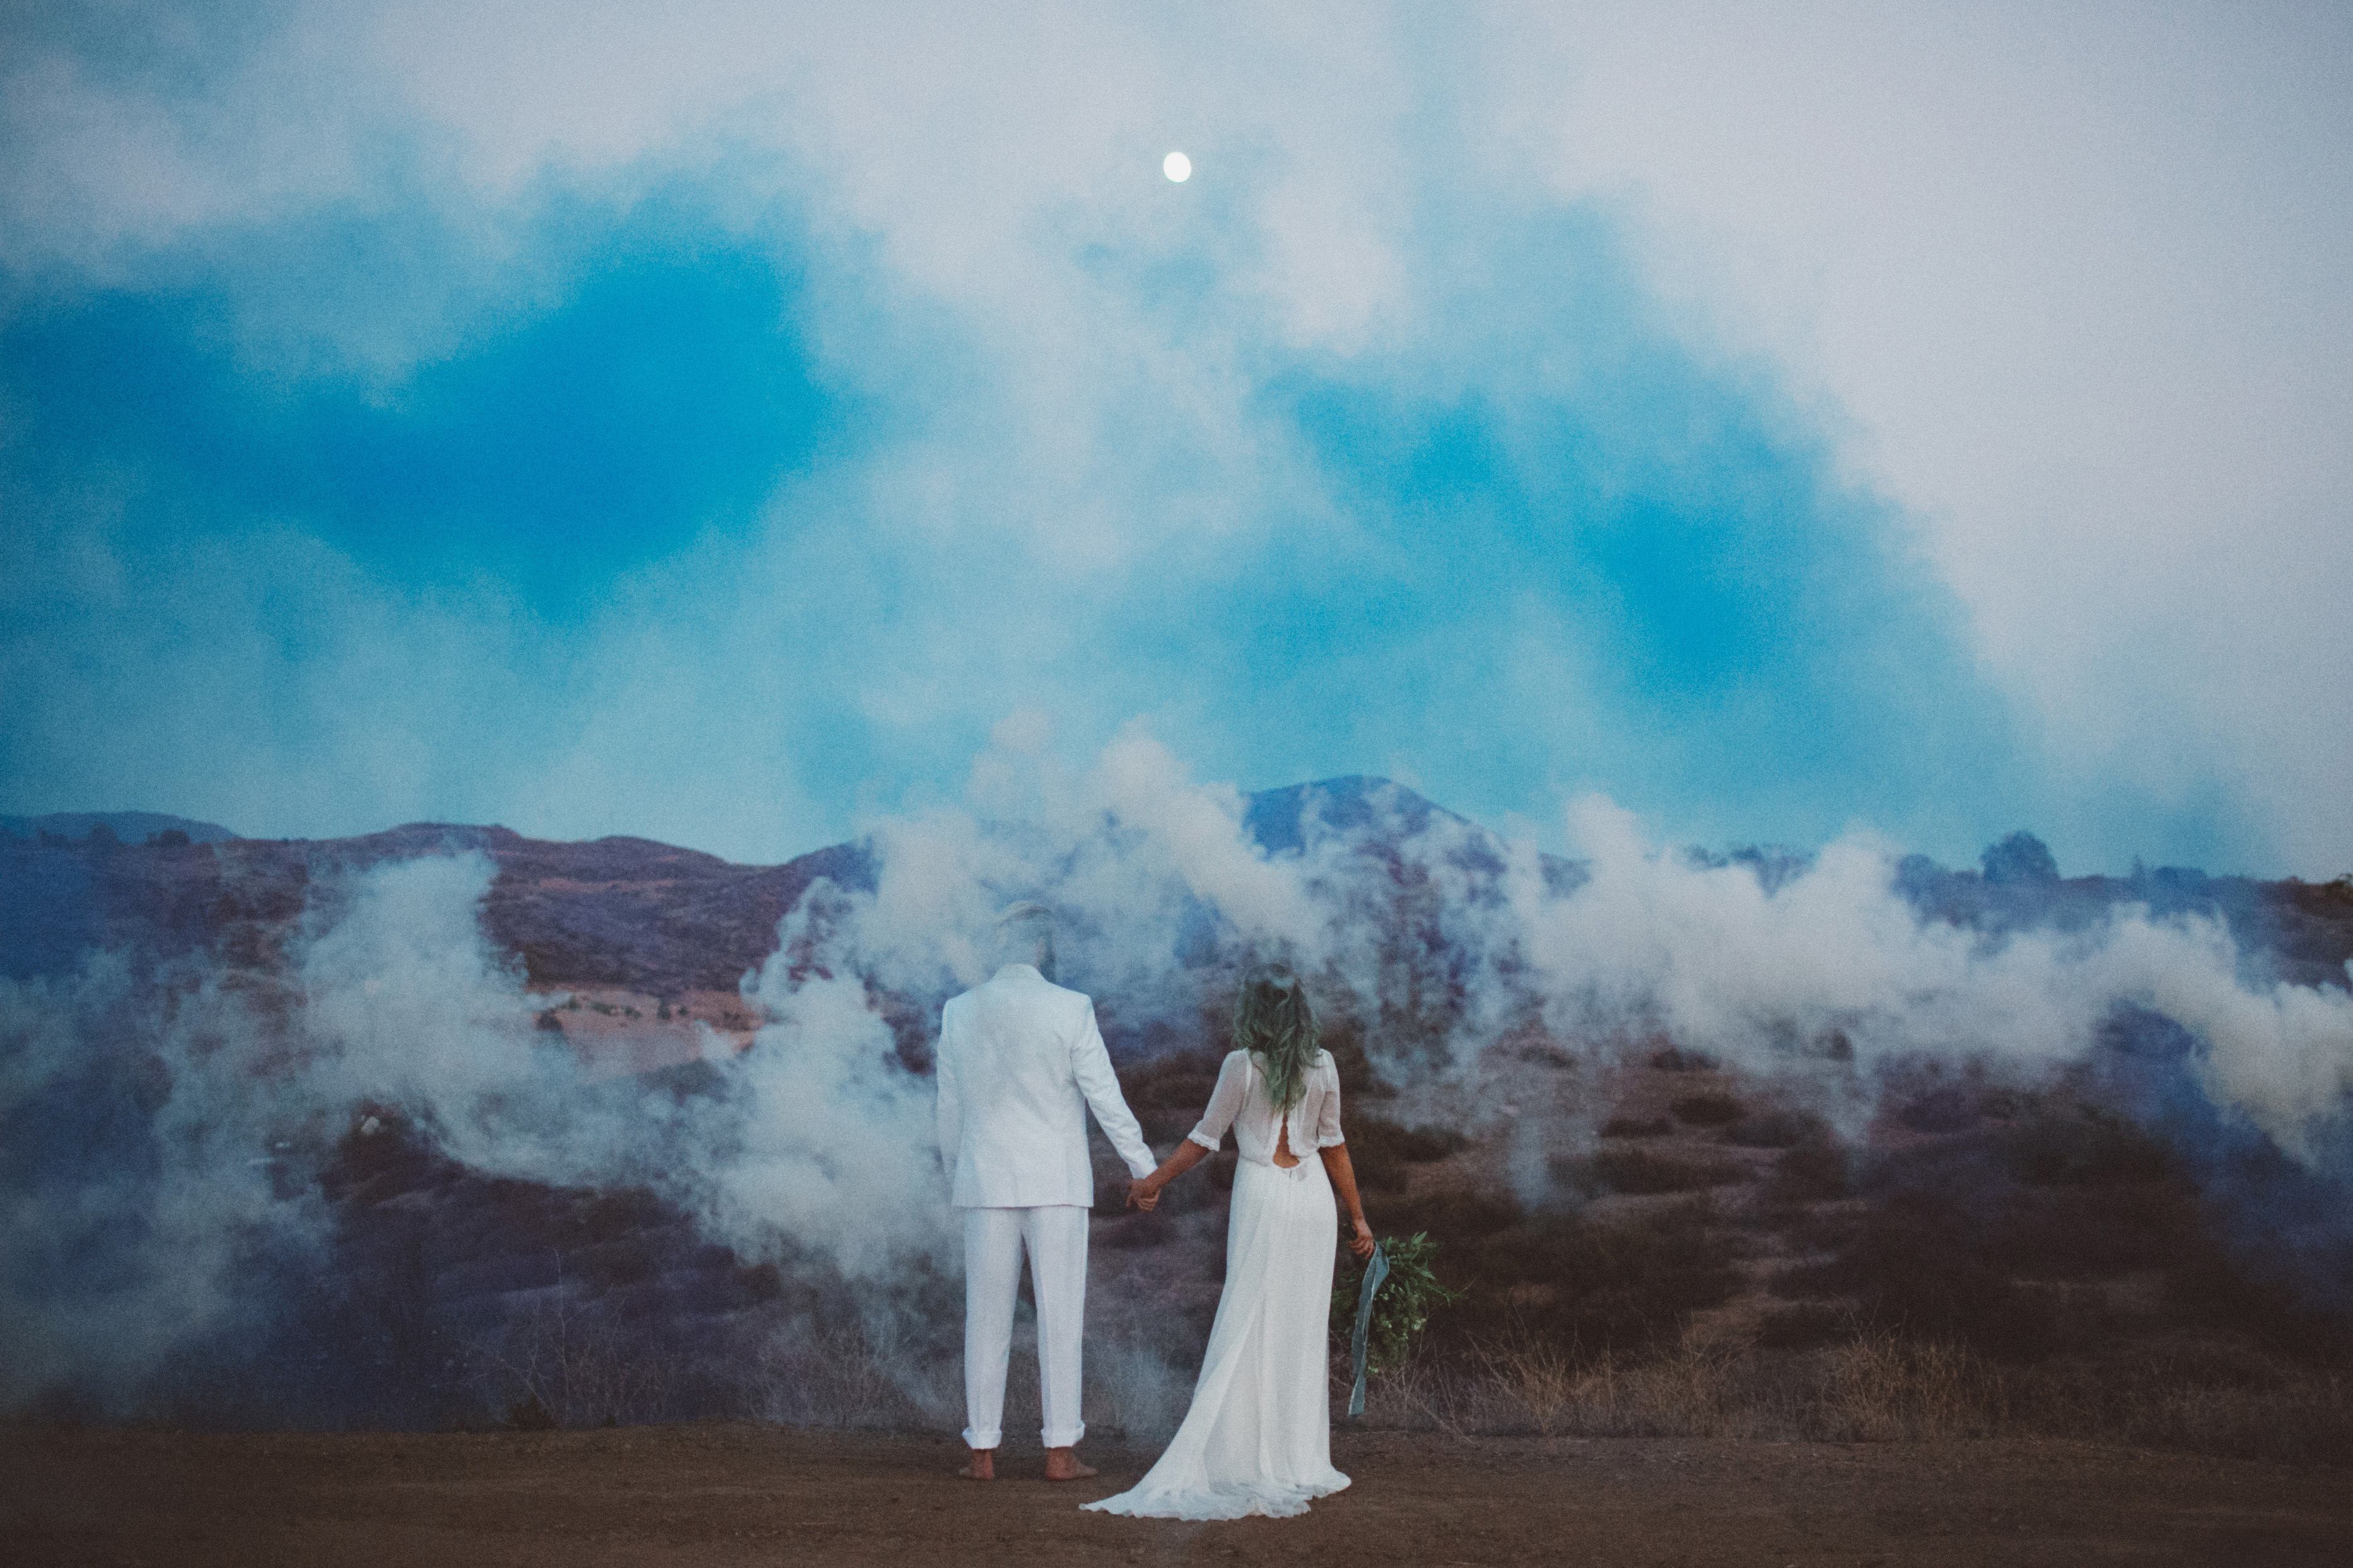 Smoke bomb inspired wedding shoot | Confetti ie